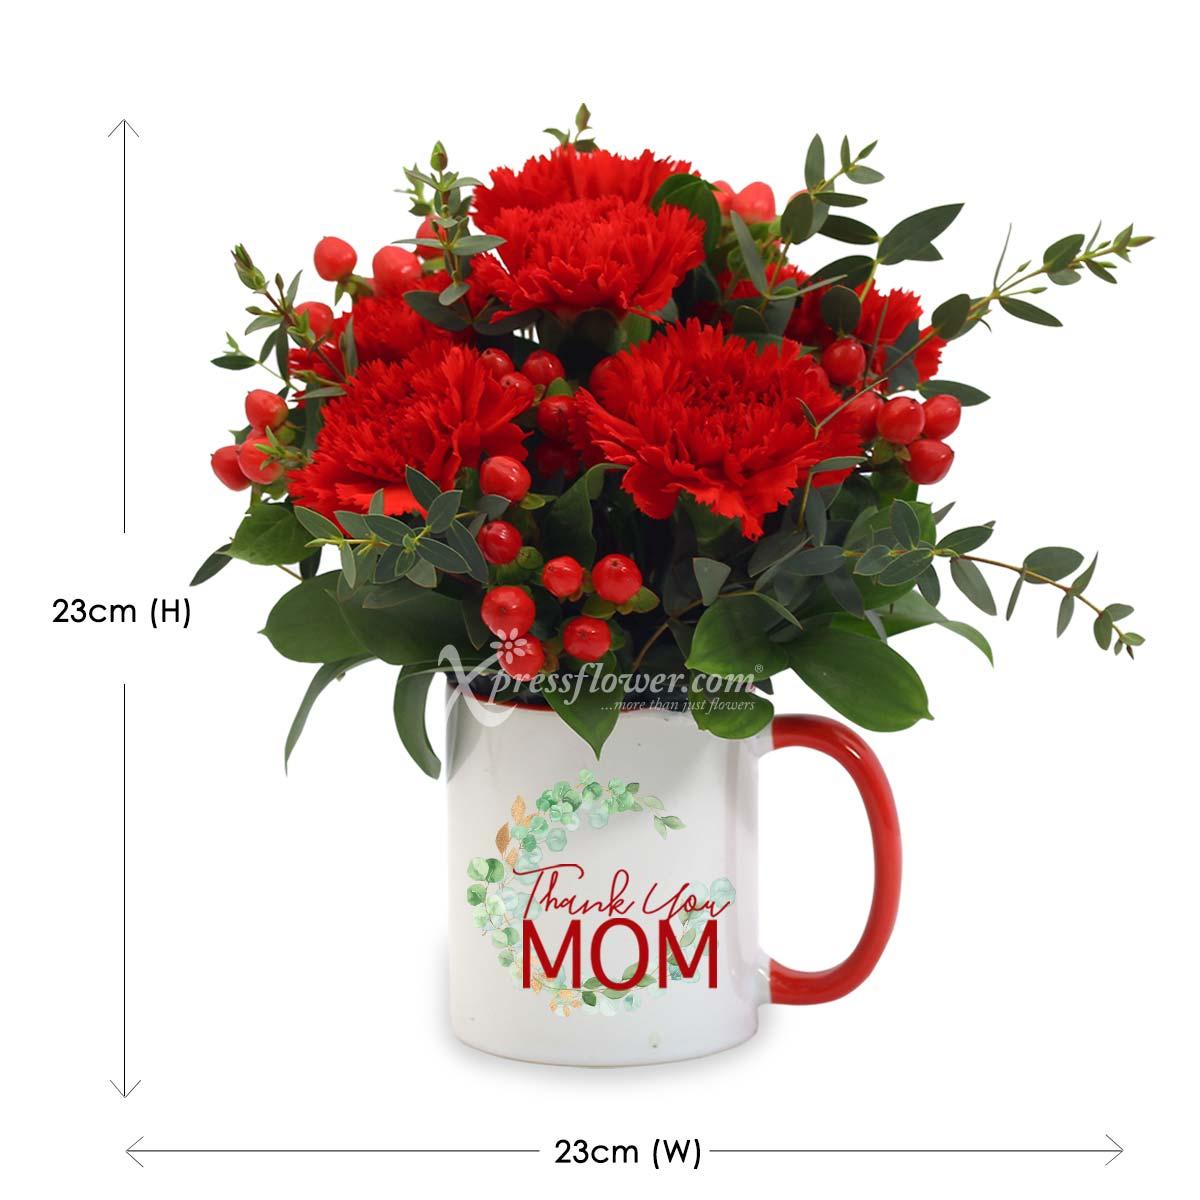 KS2006_Thank you mom_FORMDAY_D